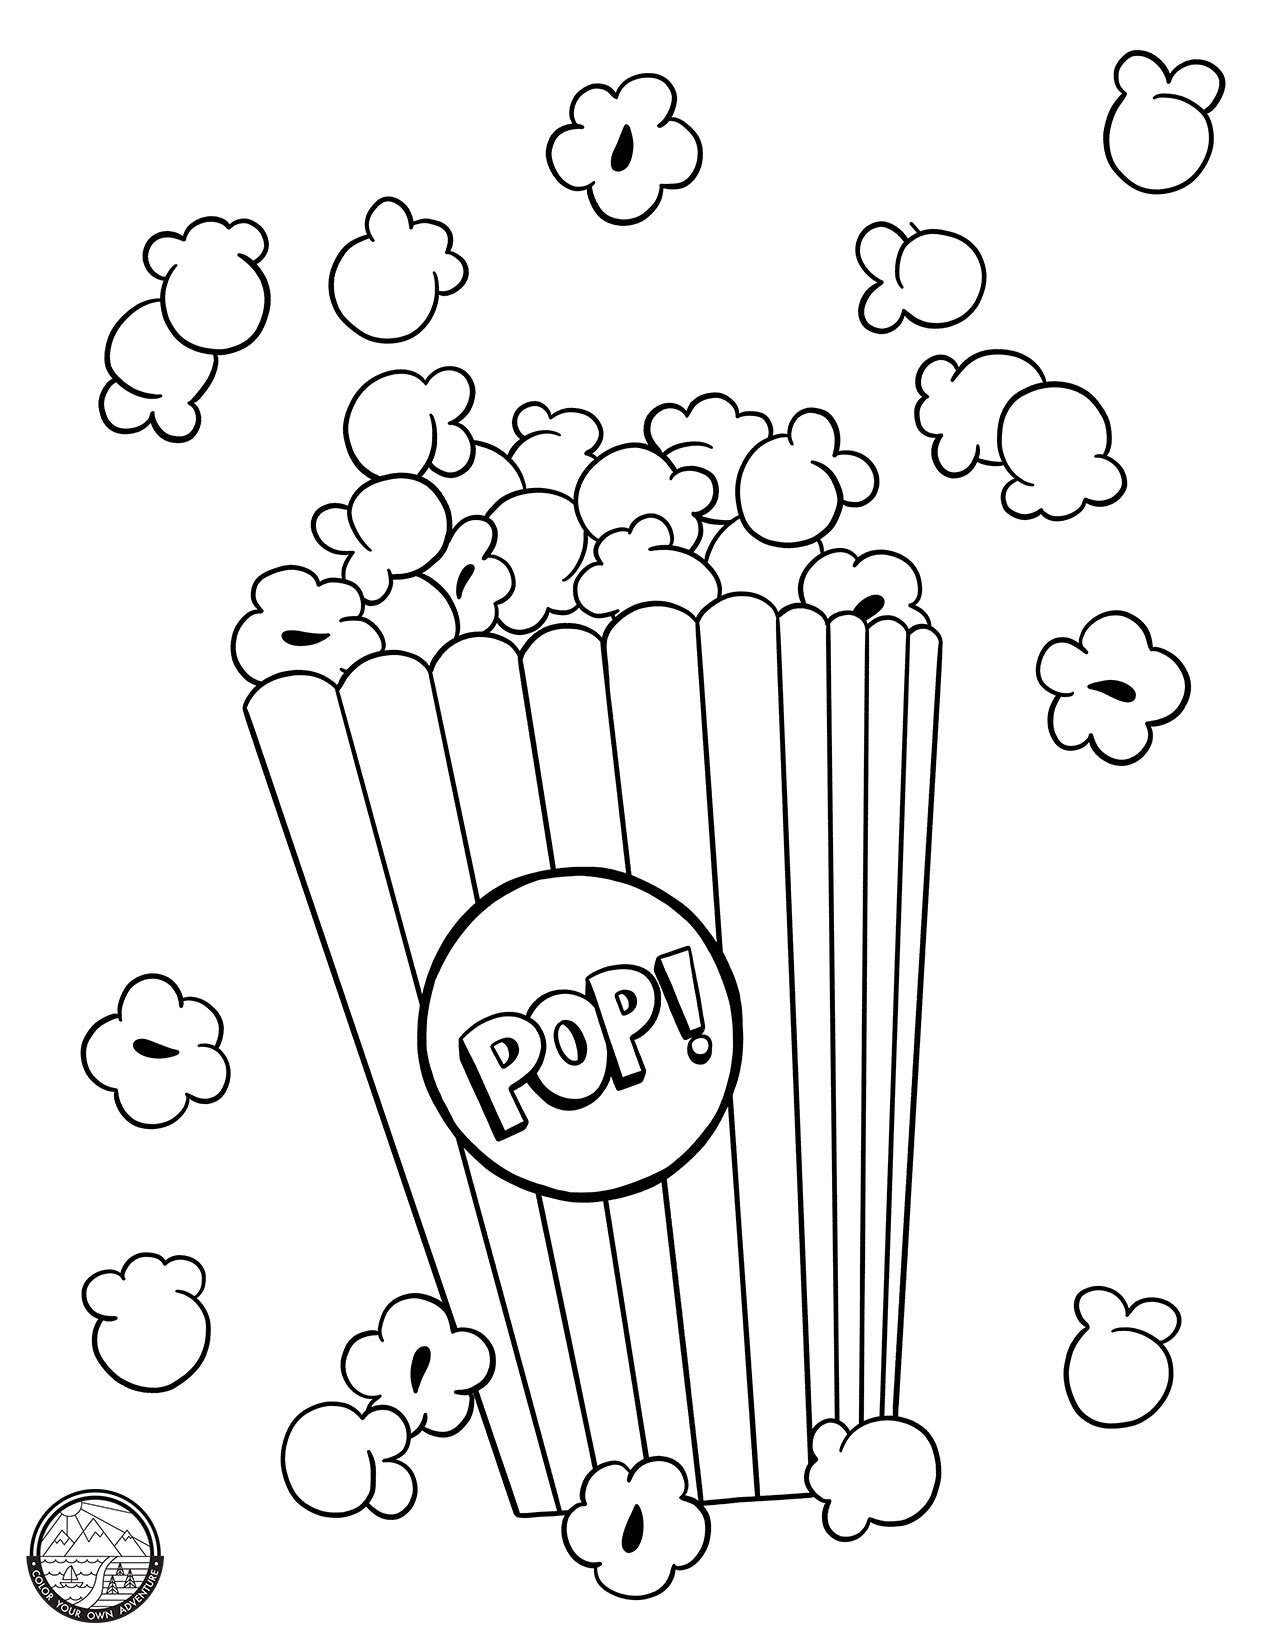 Popcorn Colouring Pages : popcorn, colouring, pages, Color, Adventure